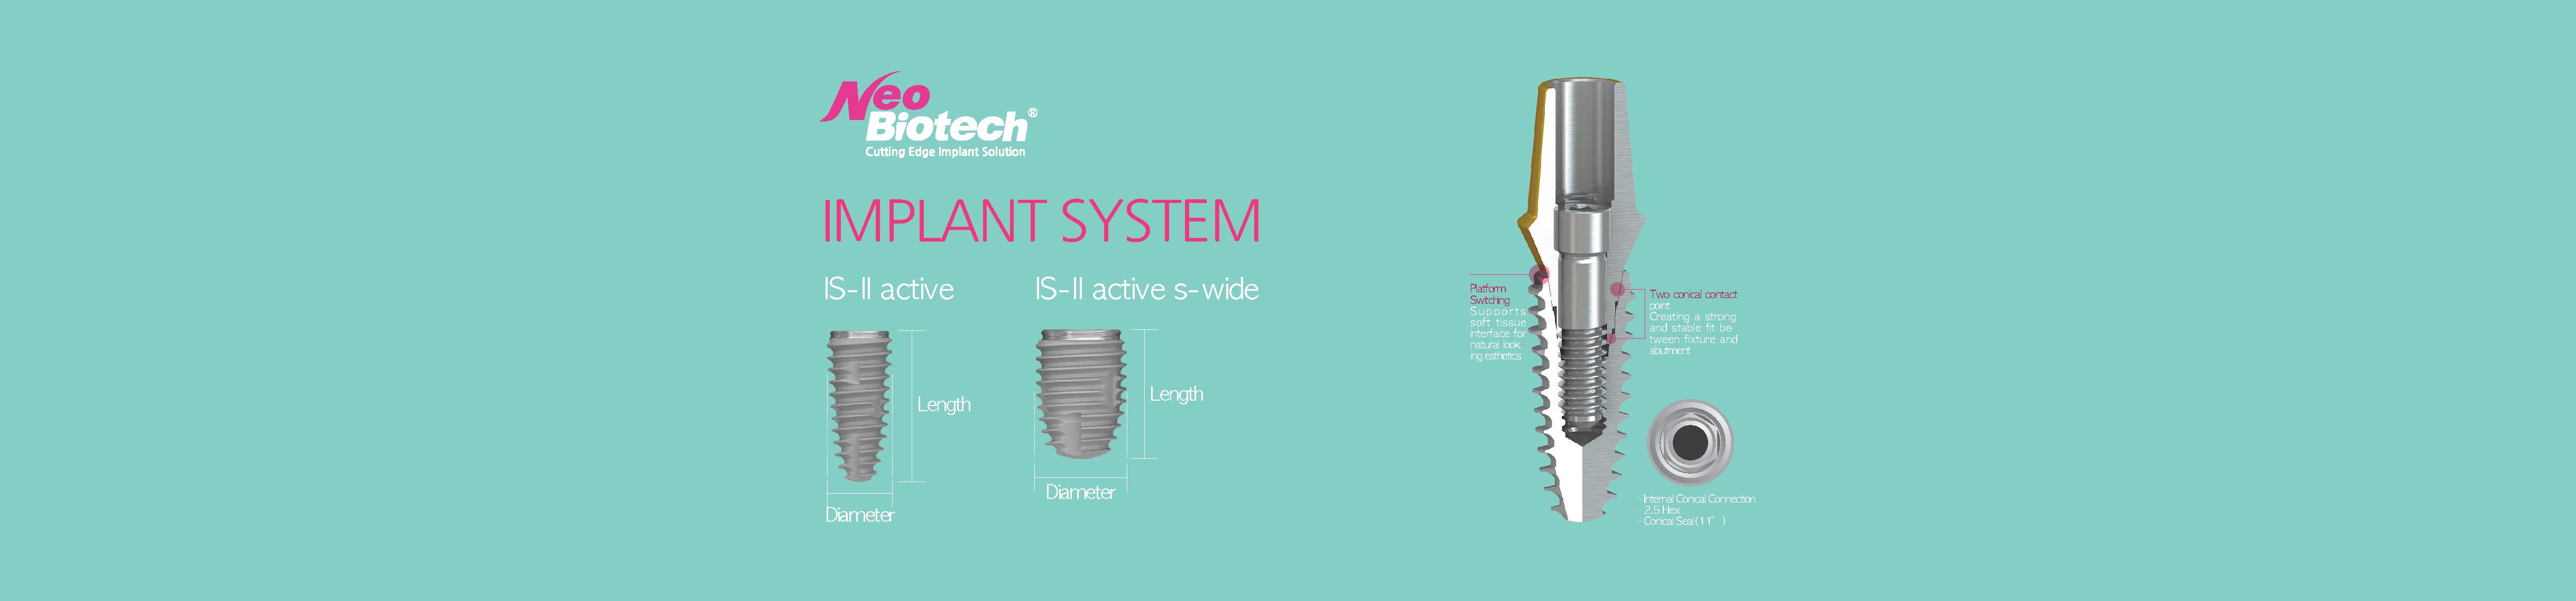 implants system.jpg